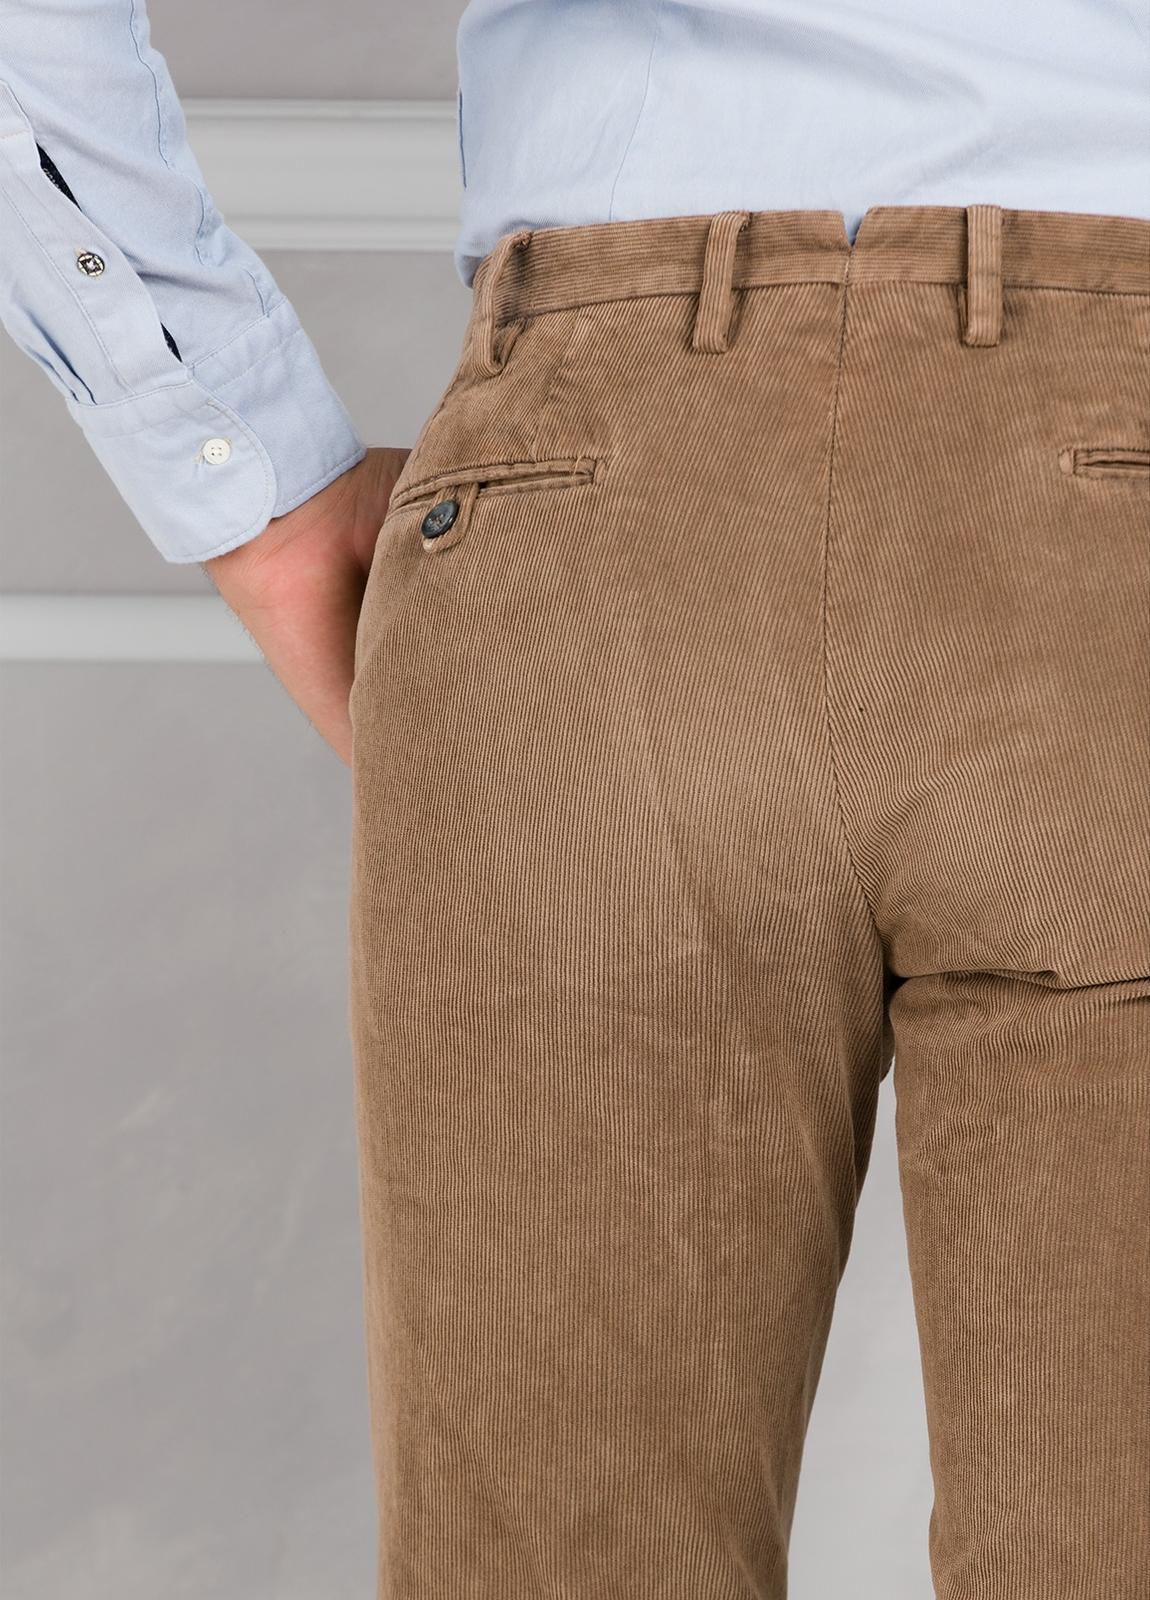 Pantalón sport de pana slim fit color tostado. 98% Algodón 2% Elastano. - Ítem1